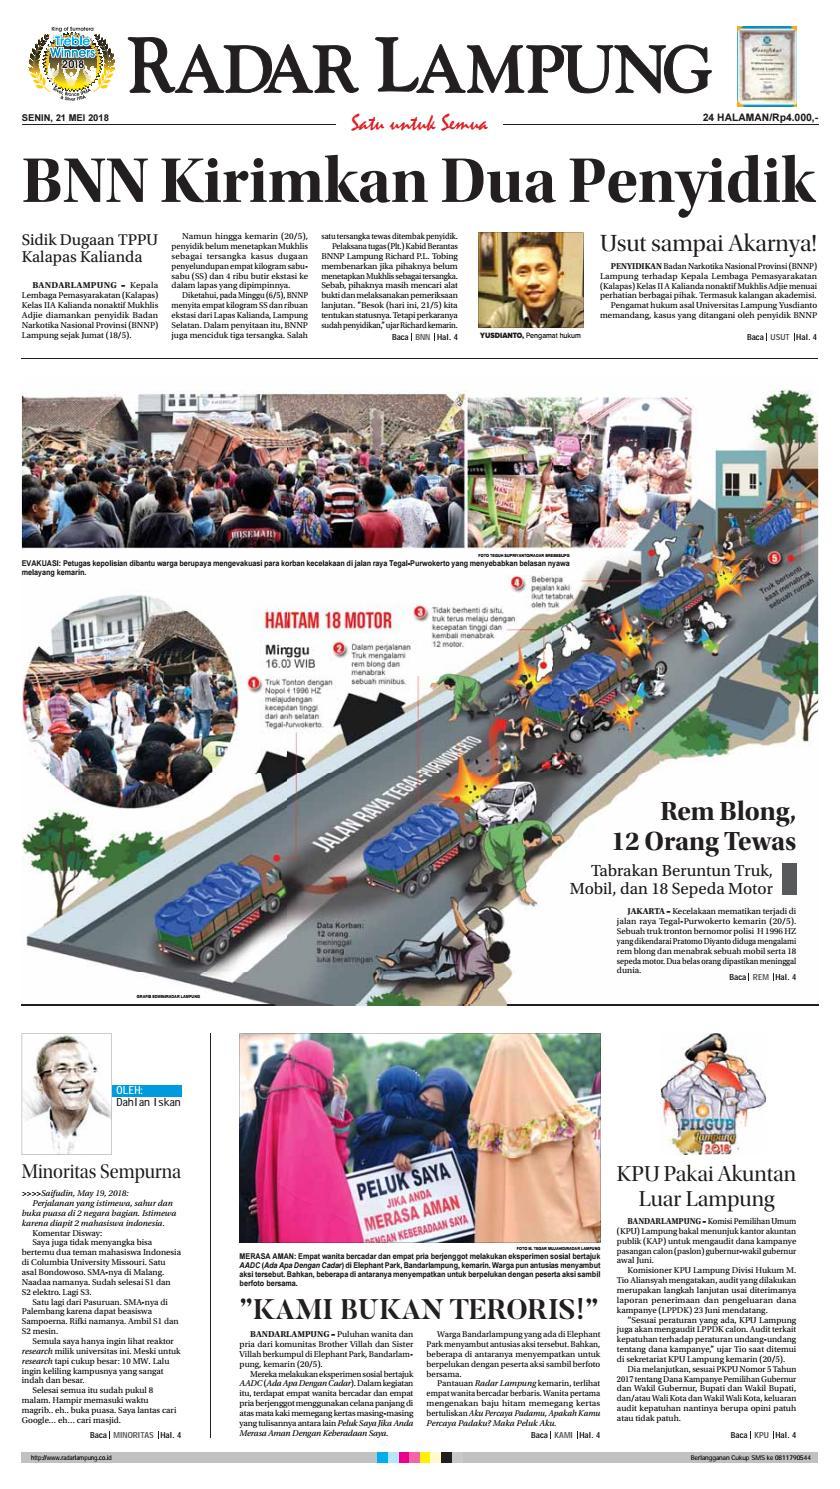 Info Harga Kaos Kaki Untuk Pria Katun Dongker Soc 181 Terbaru 2018 Tcash Vaganza 36 Produk Ukm Bumn Kain Batik Print Motif1 210518 By Ayep Kancee Issuu